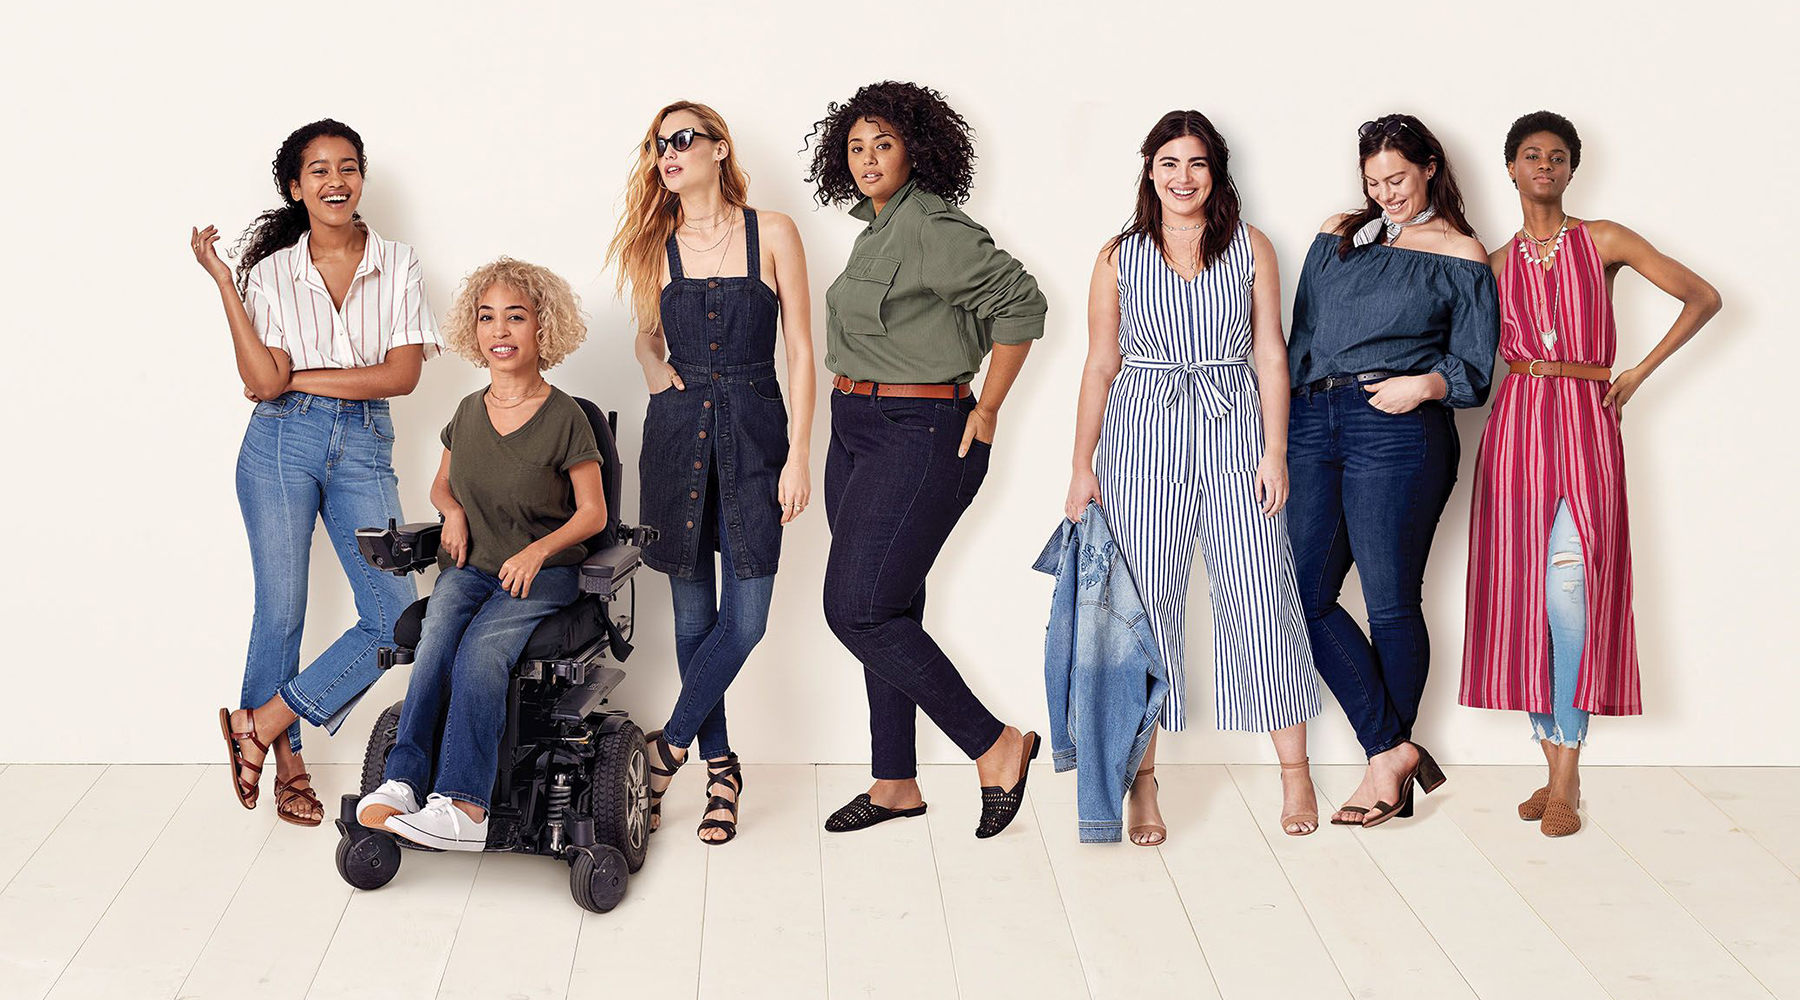 moda adaptive_adaptive fashion